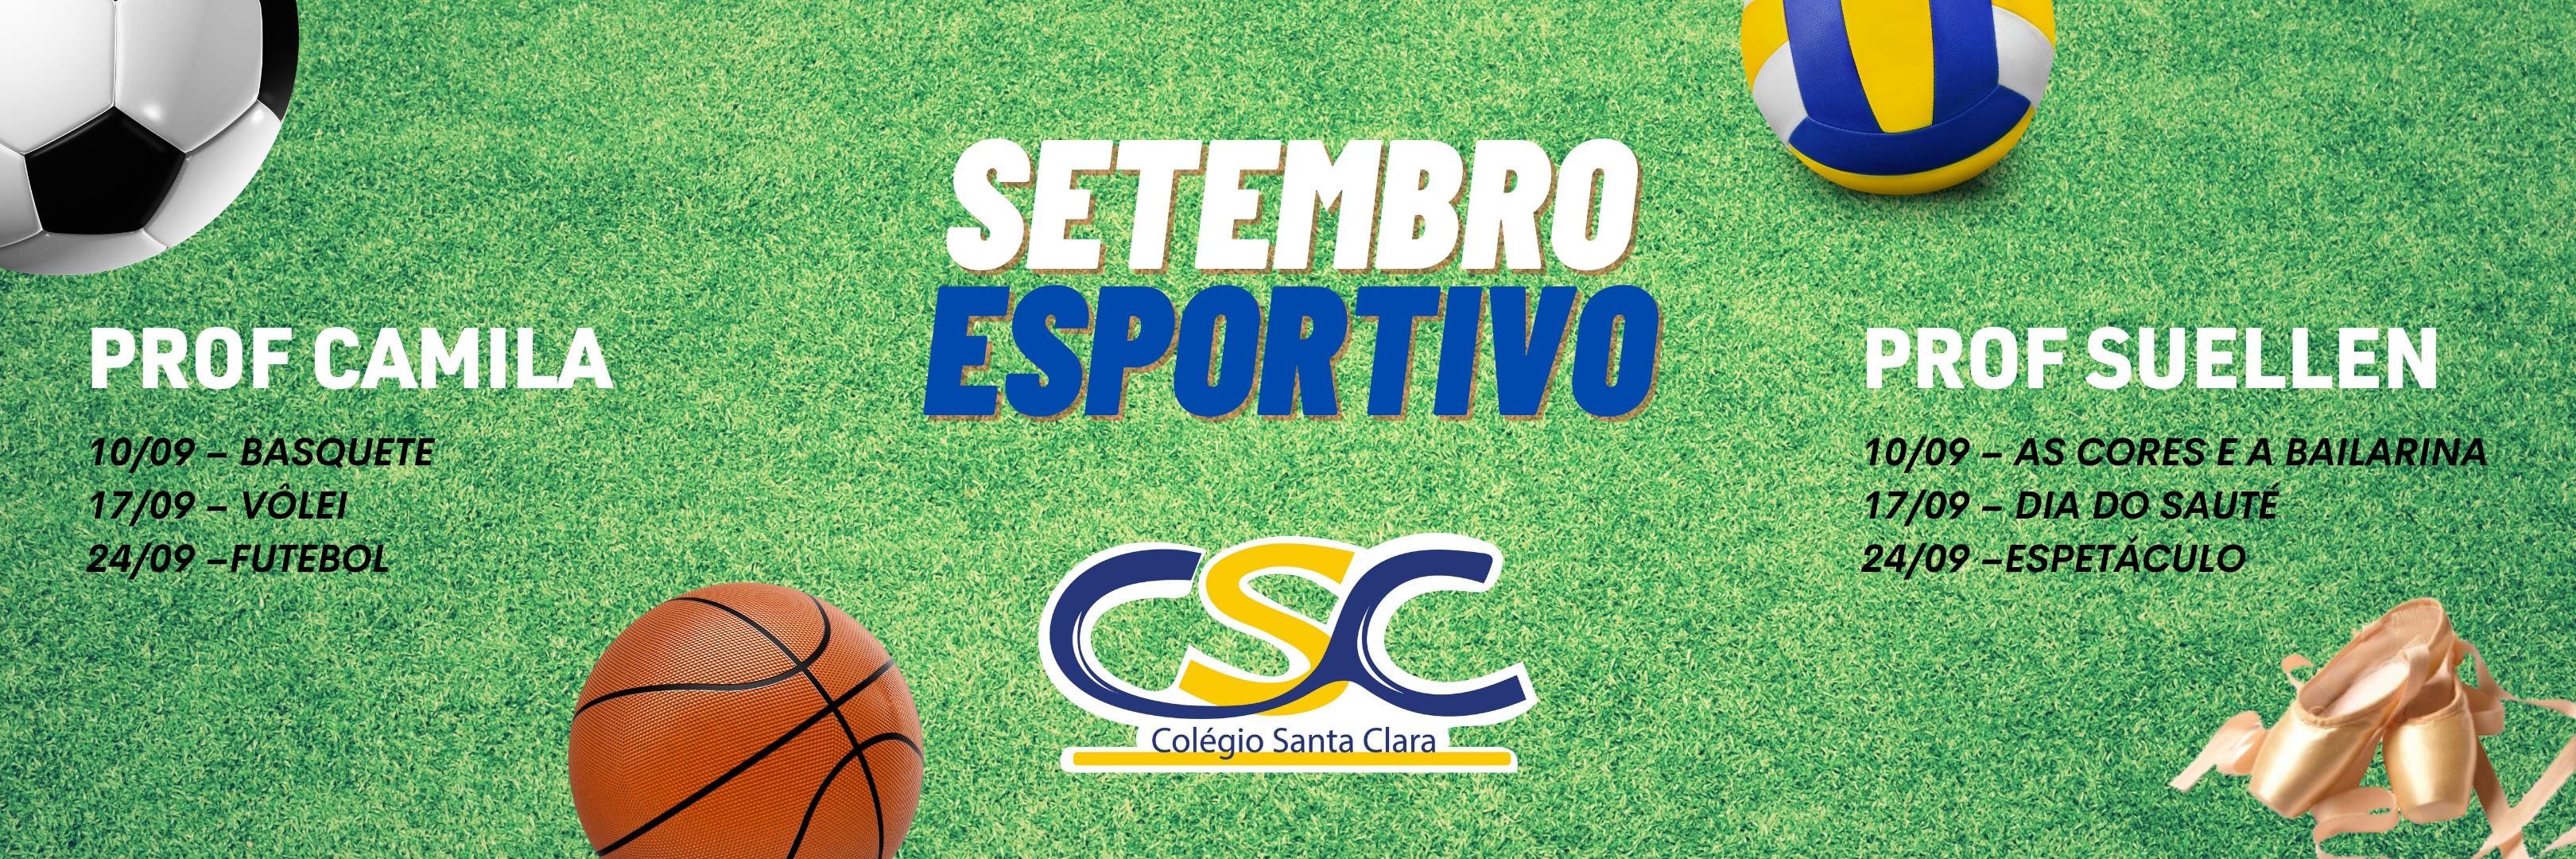 SETEMBRO ESPORTIVO.png